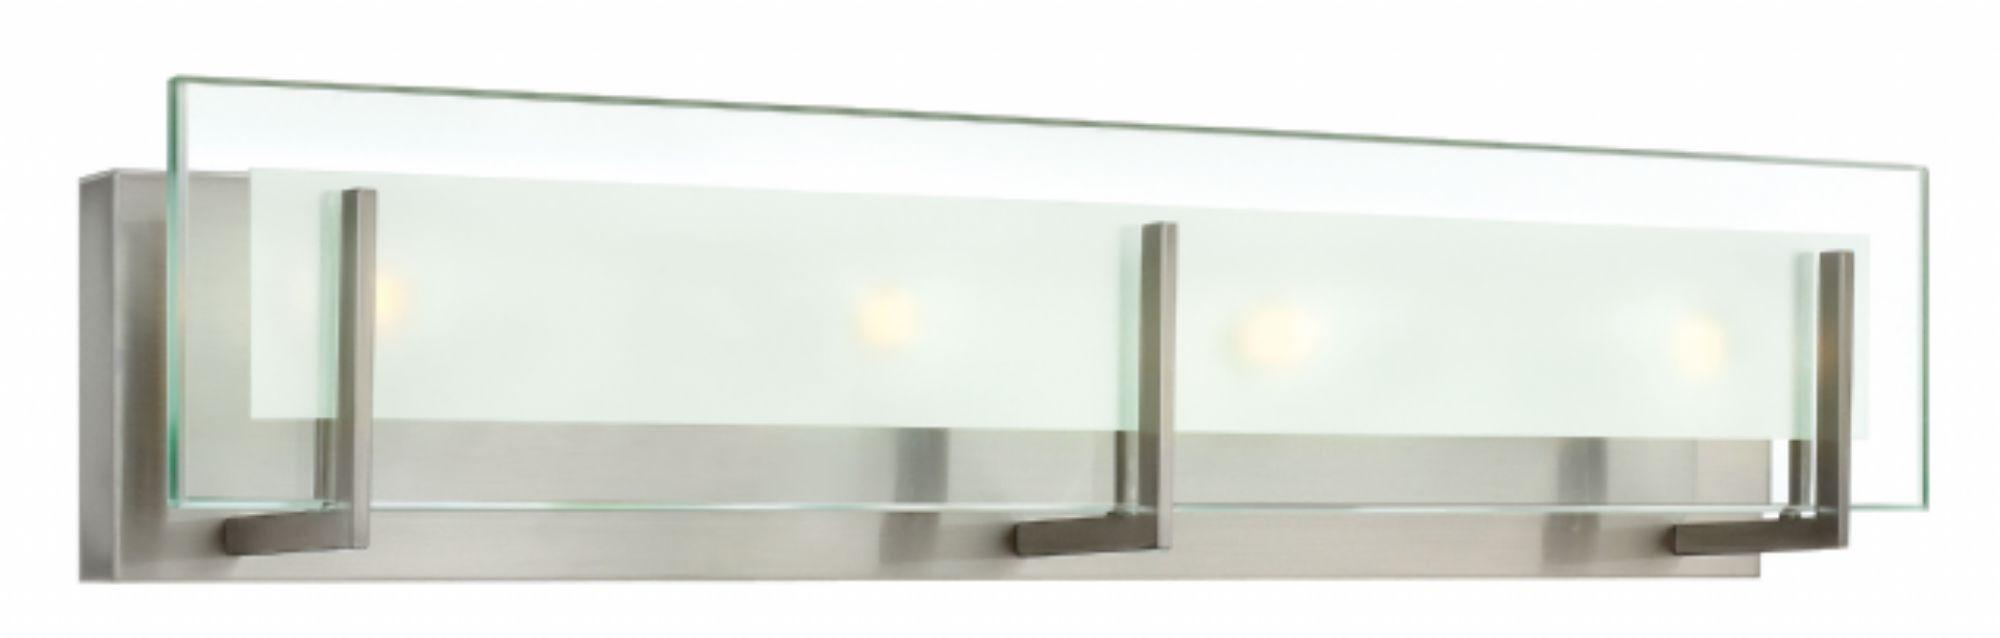 Latest Brushed Nickel Latitude > Interior Wall Mount Regarding Contemporary Hinkley Lighting (View 15 of 20)